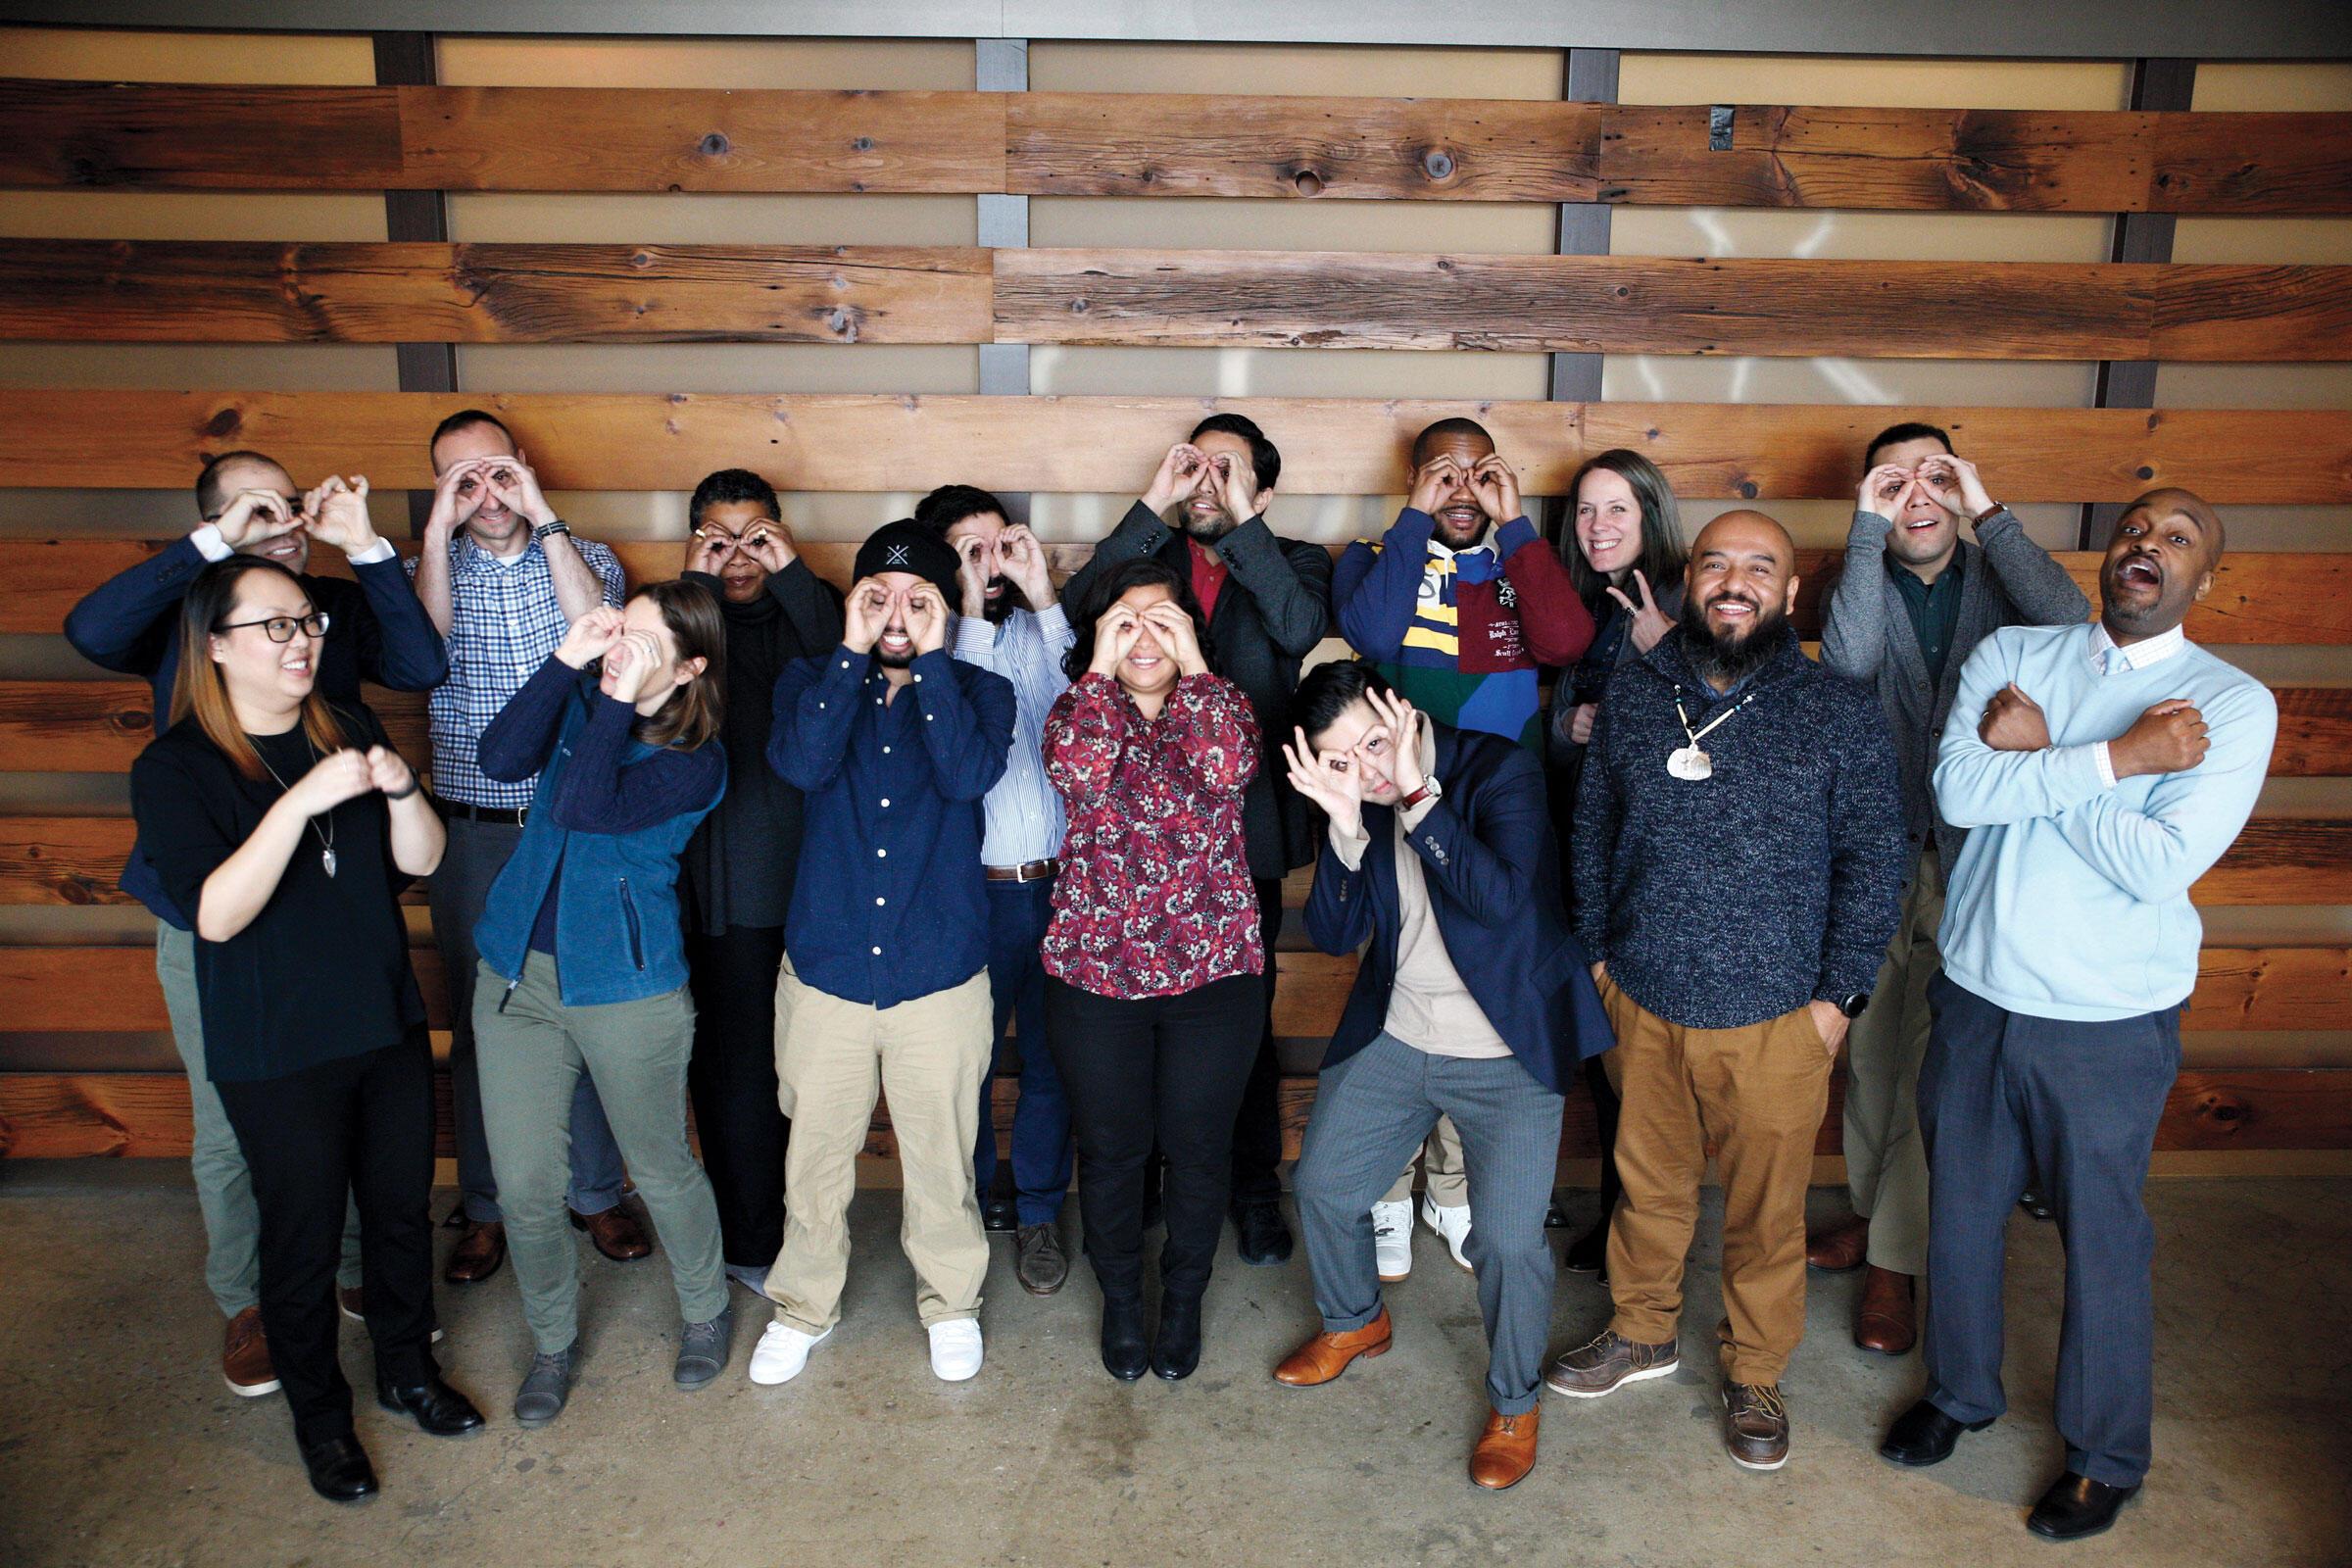 The 2019 cohort of Fund II Apprentices visit the New York headquarters for orientation. Luke Franke/Audubon